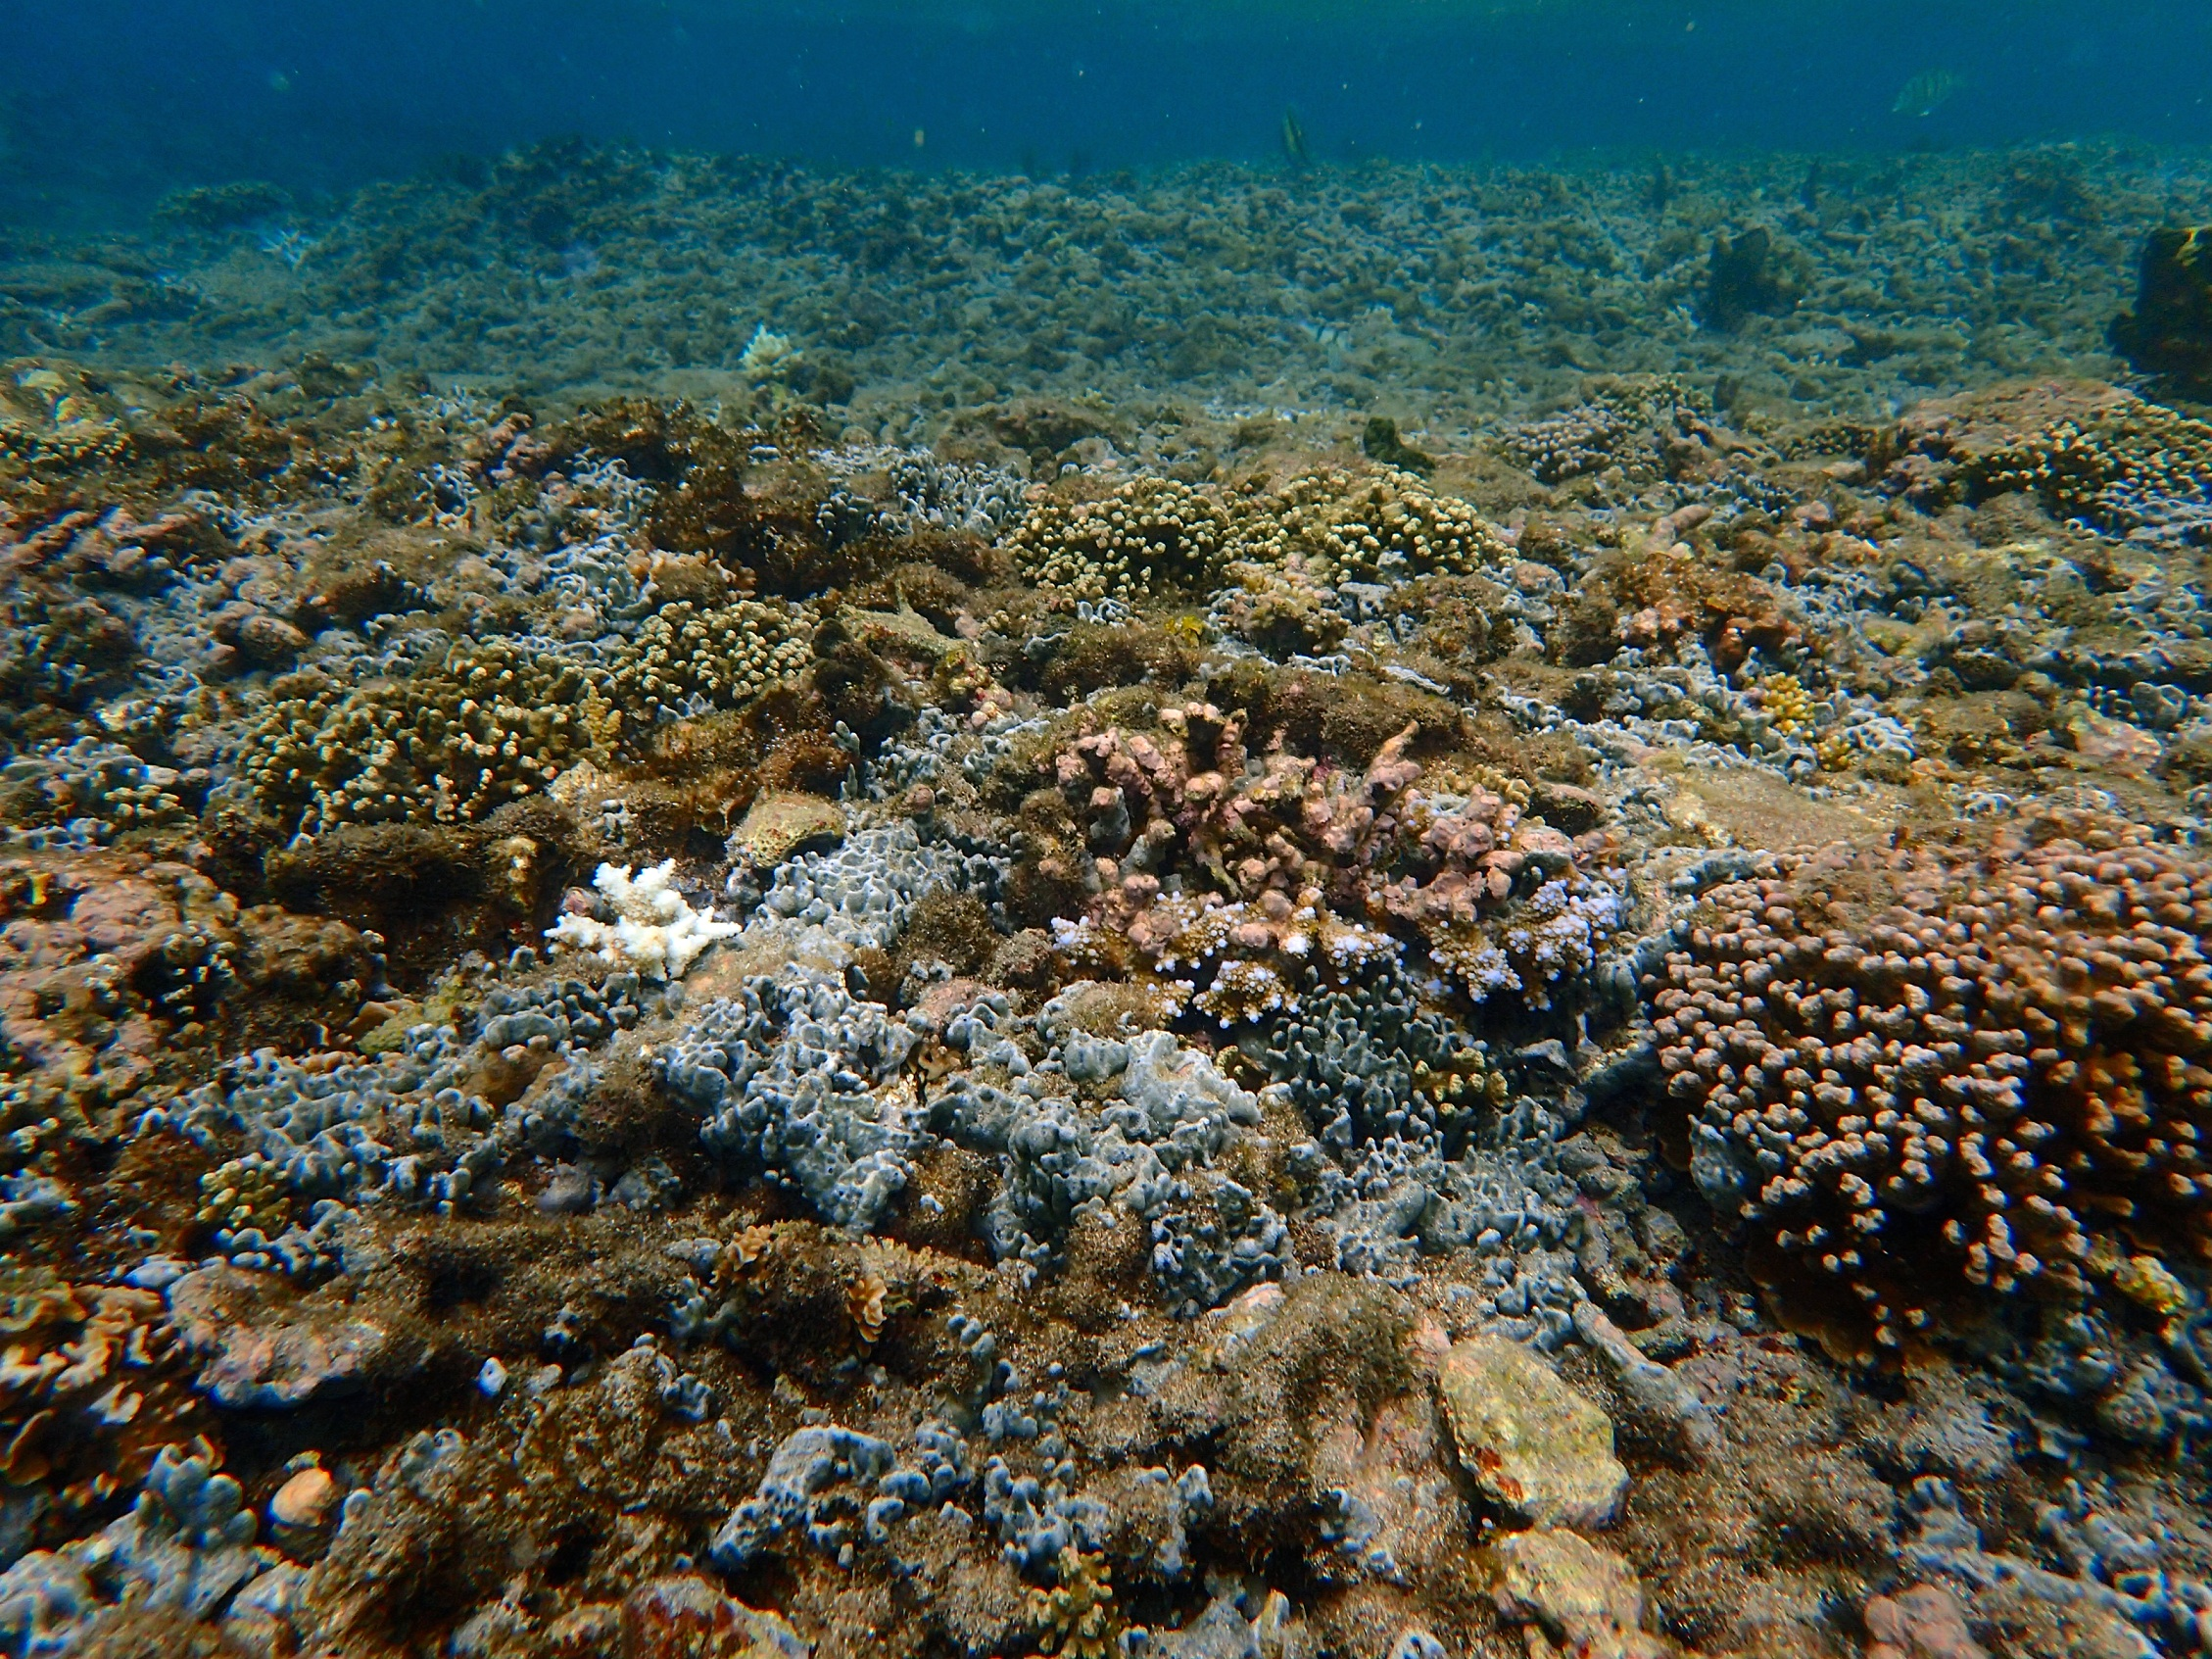 http://ekladata.com/APBQ0E0139mFnJ1YNwty7aPKhd8/reunion-saint-pierre-paysage-corallien.jpg